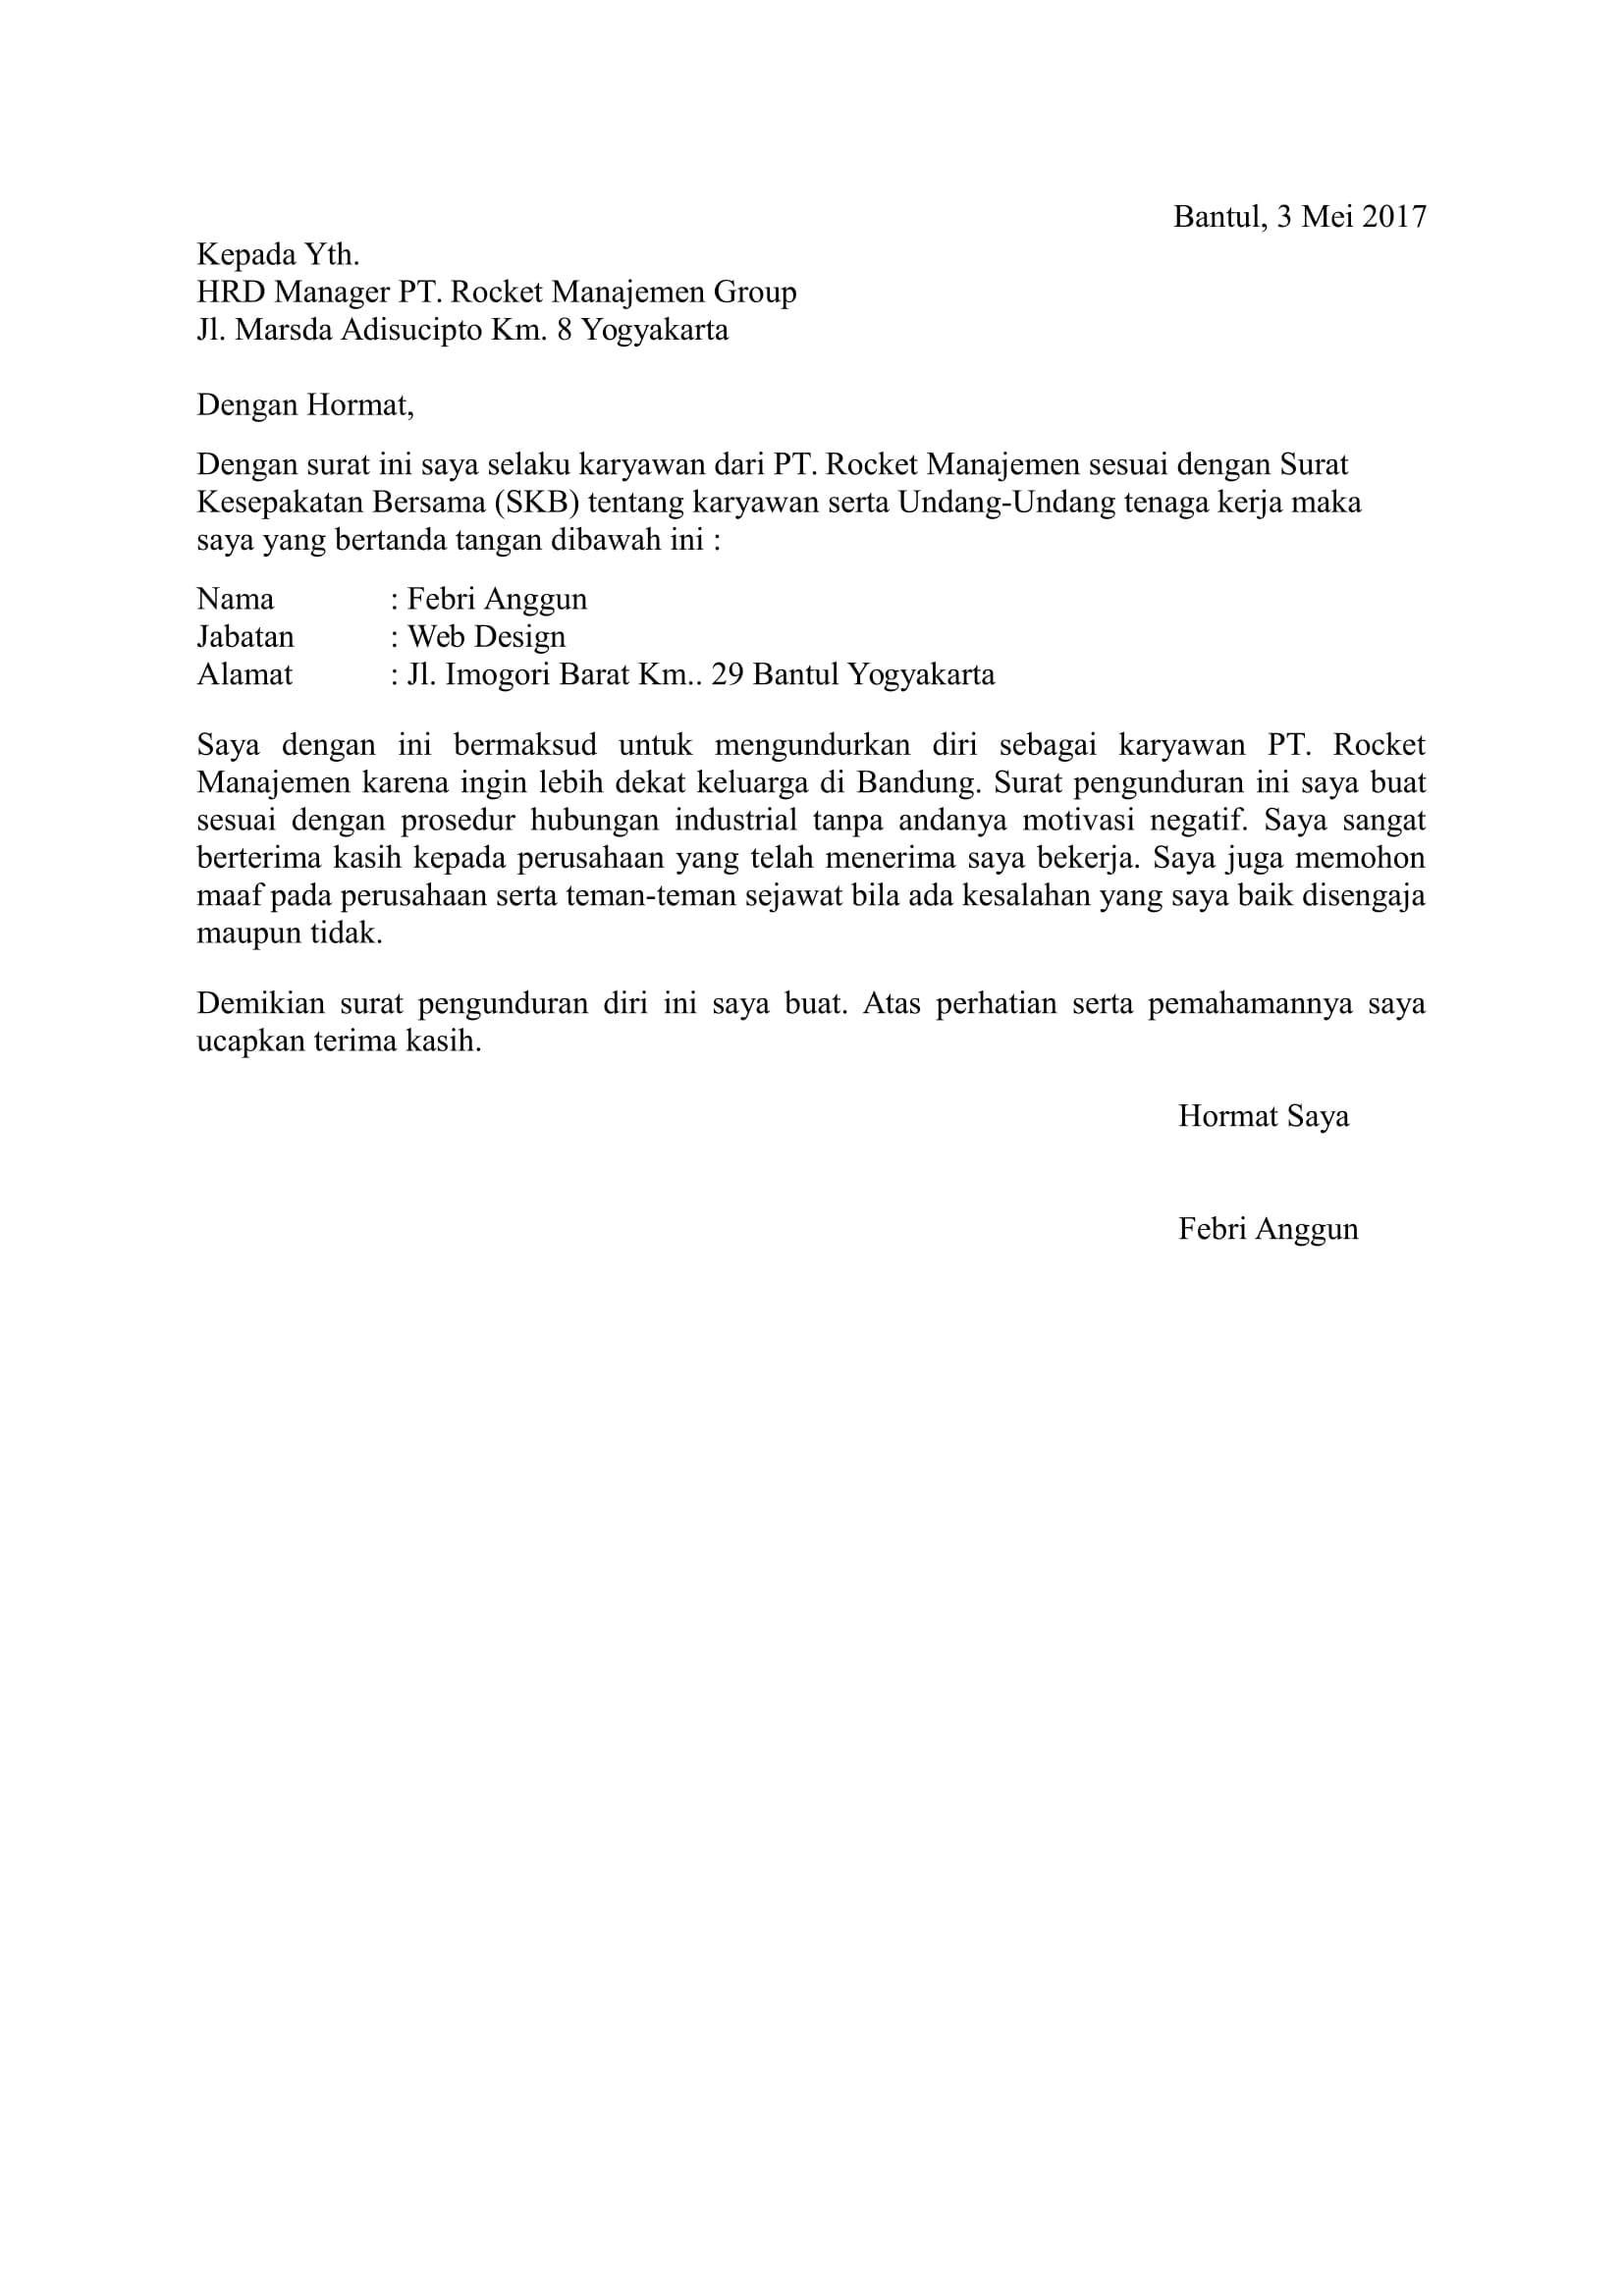 Image Result For Contoh Surat Pengunduran Diri Pdf Lisda Pdf